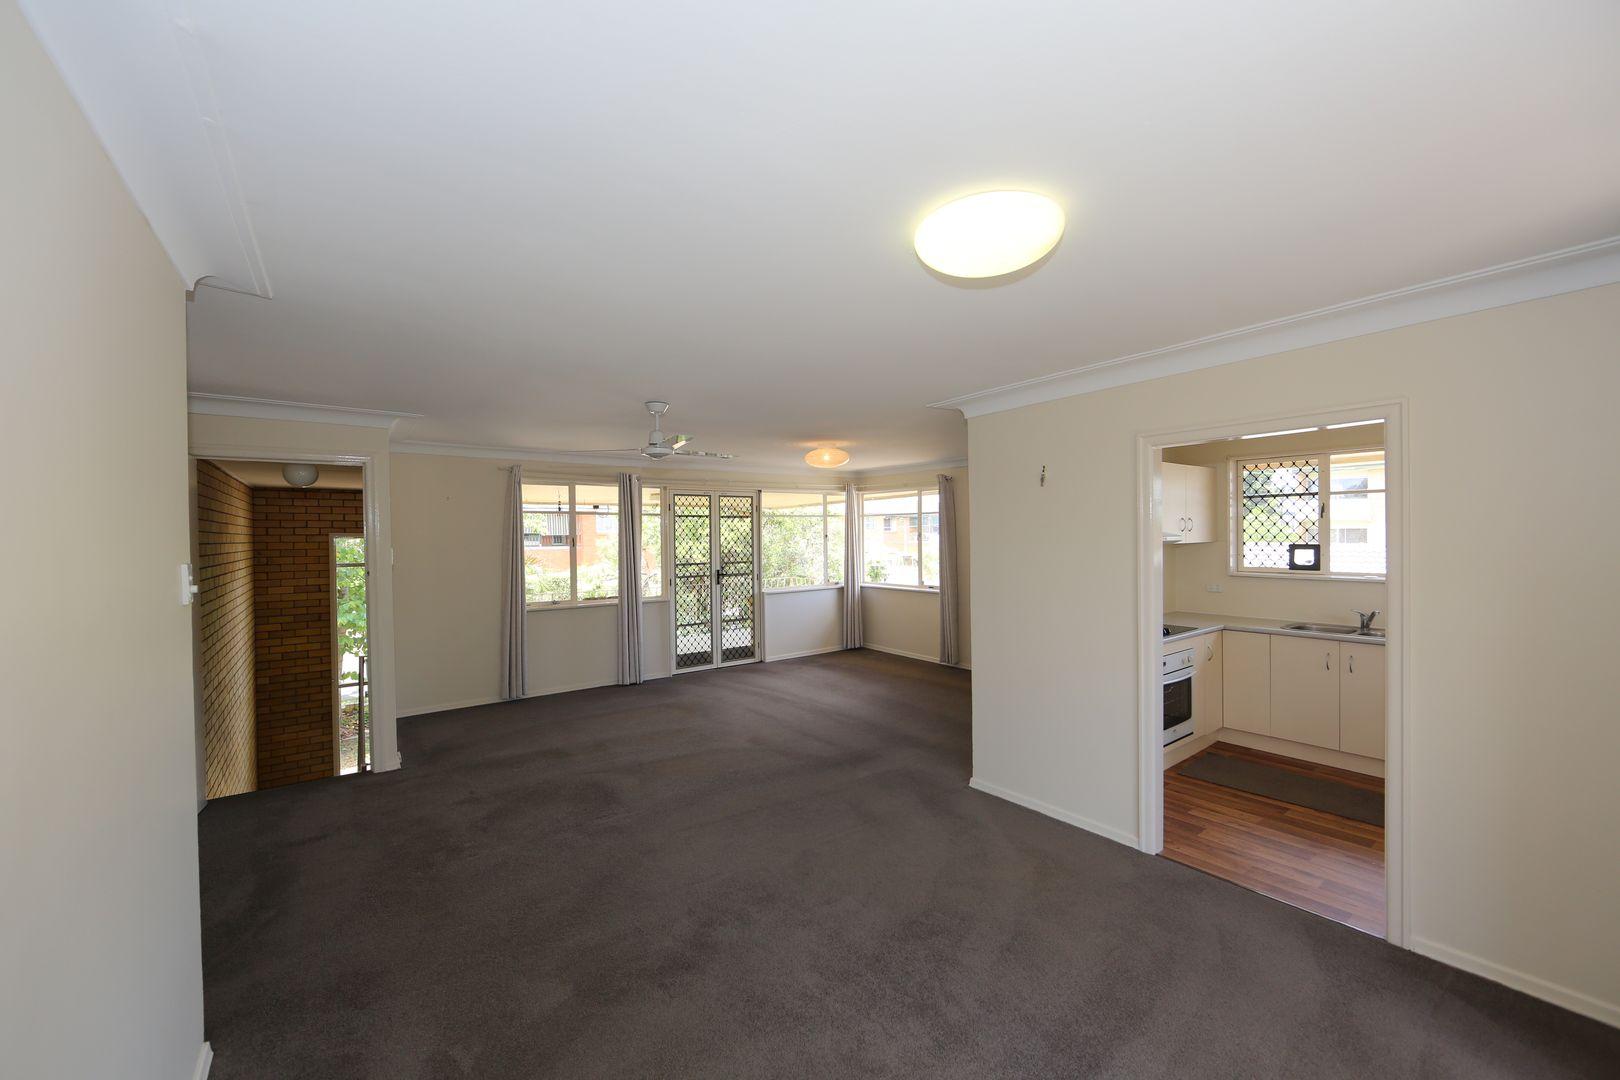 14 Nagle Street, Upper Mount Gravatt QLD 4122, Image 2